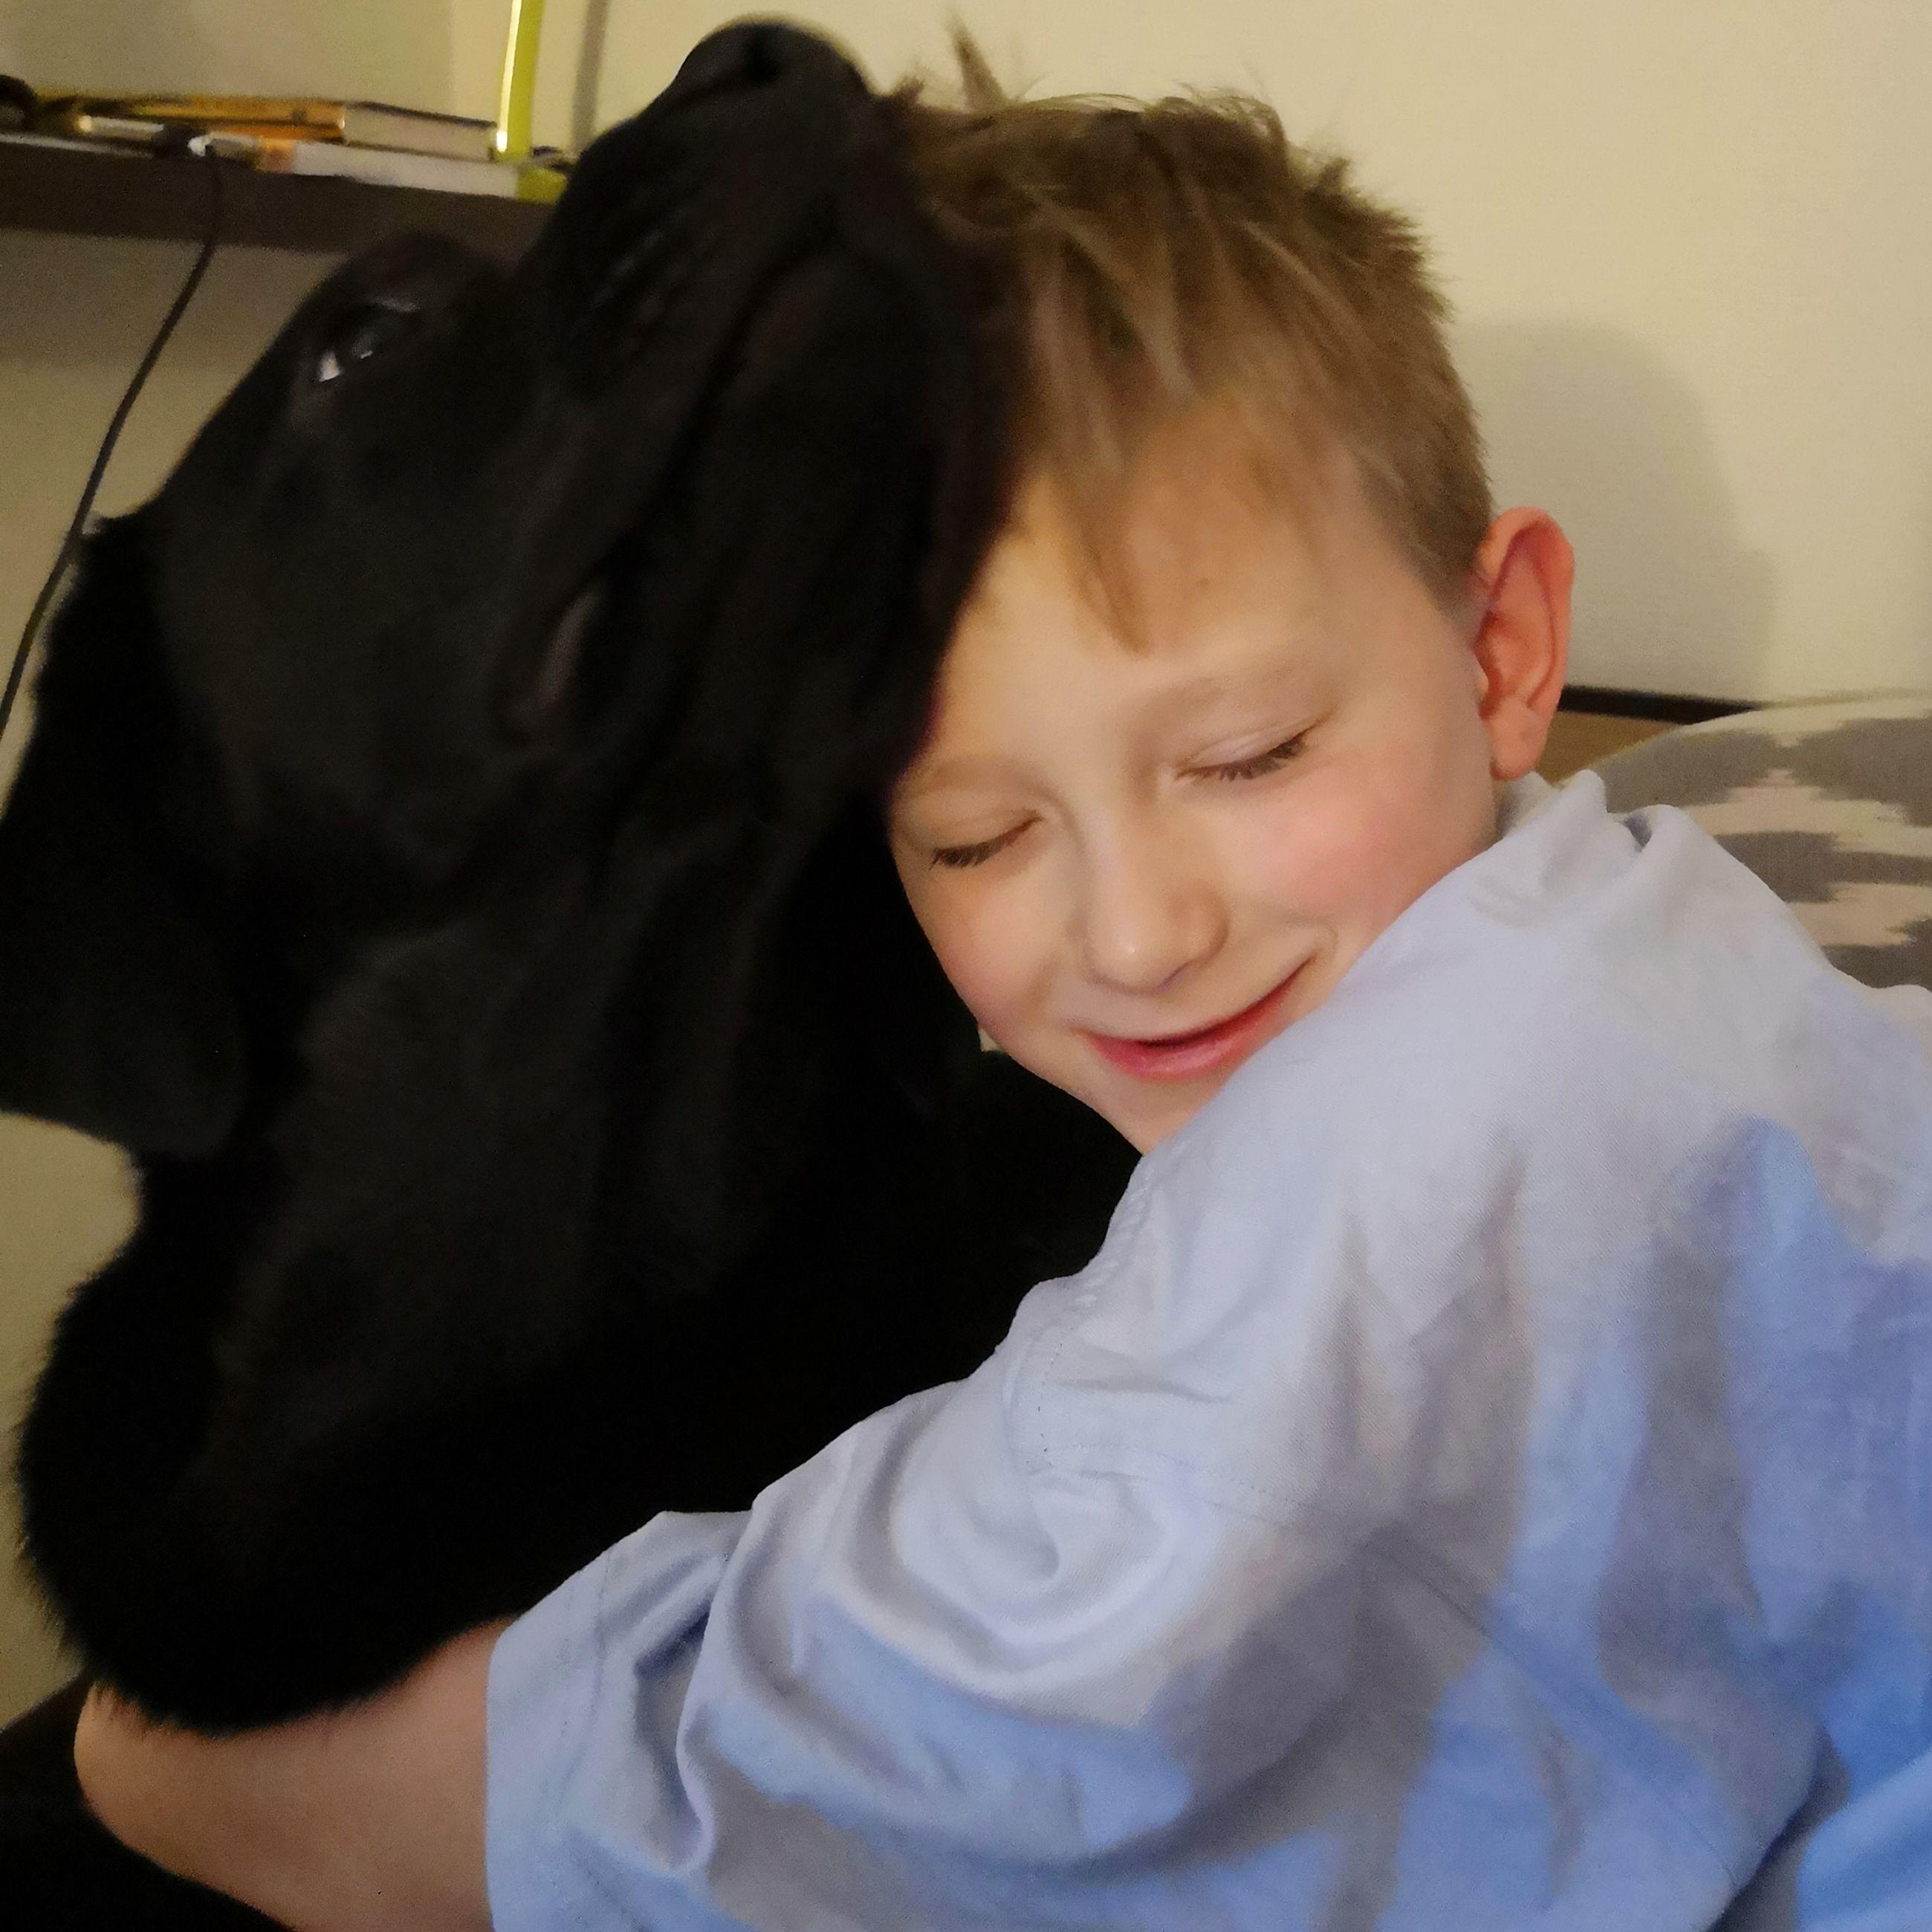 Close-up of boy embracing dog at home